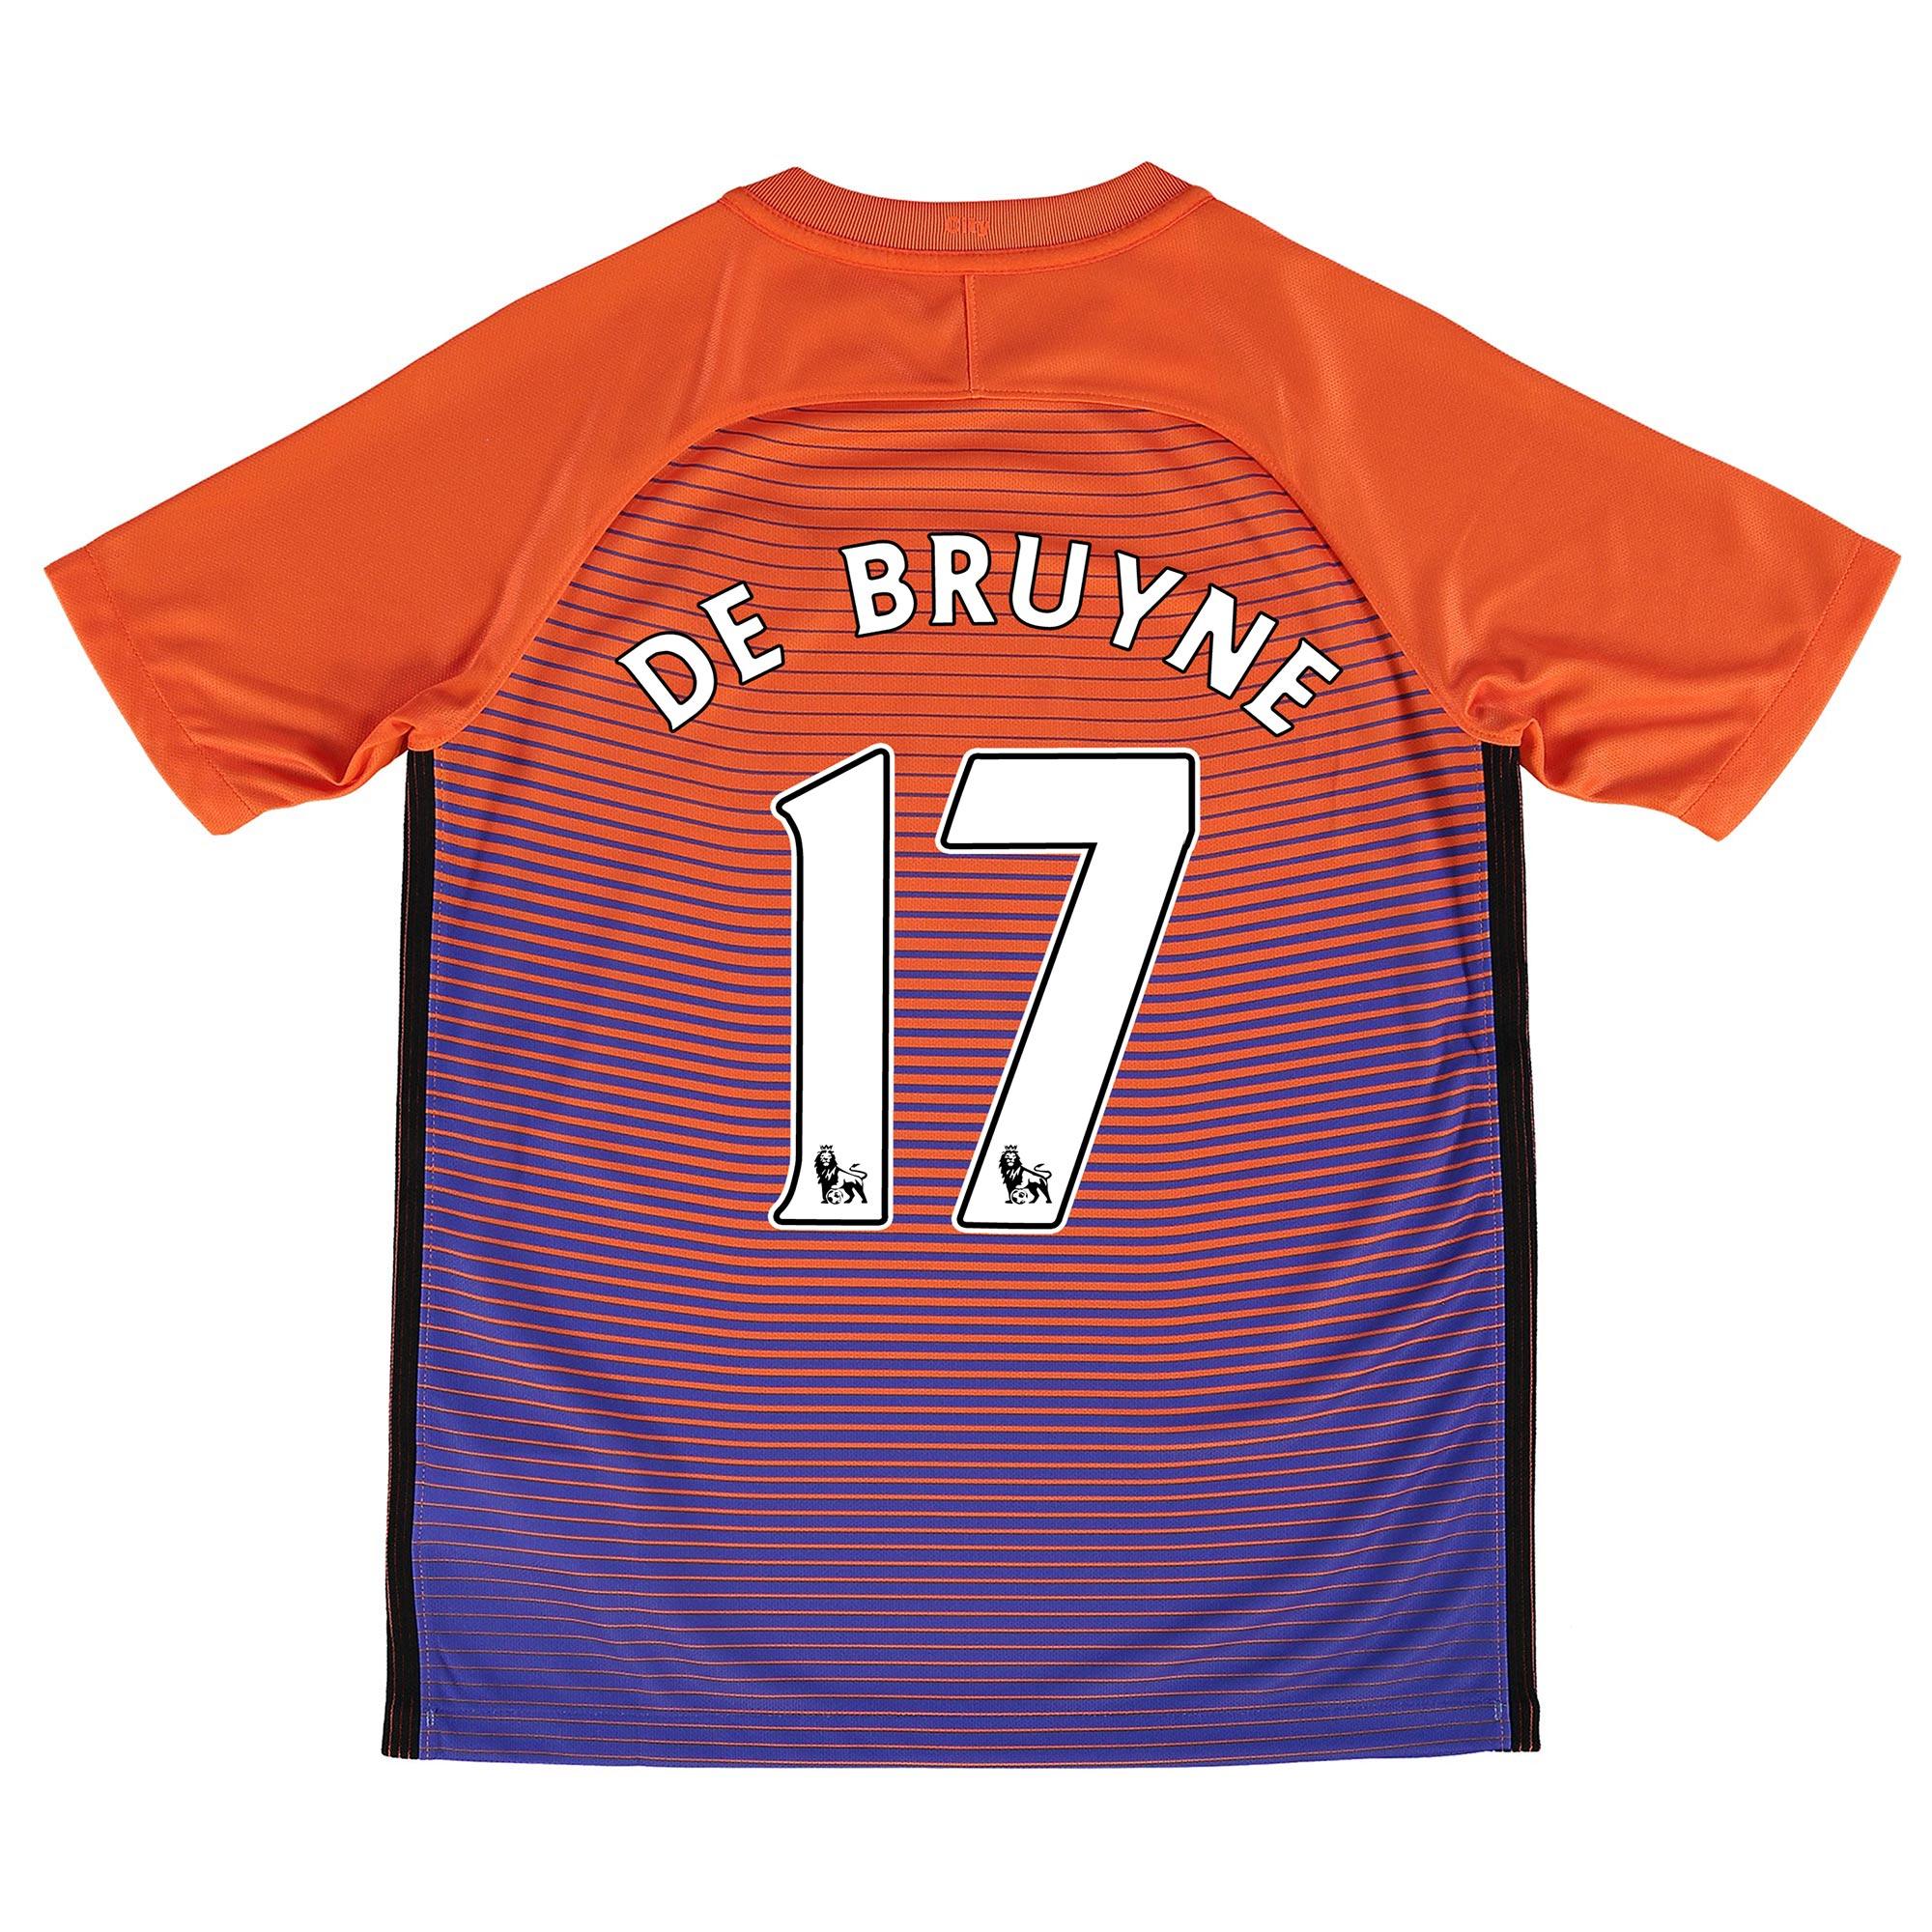 Manchester City Third Stadium Shirt 2016-17 - Kids with De Bruyne 17 p